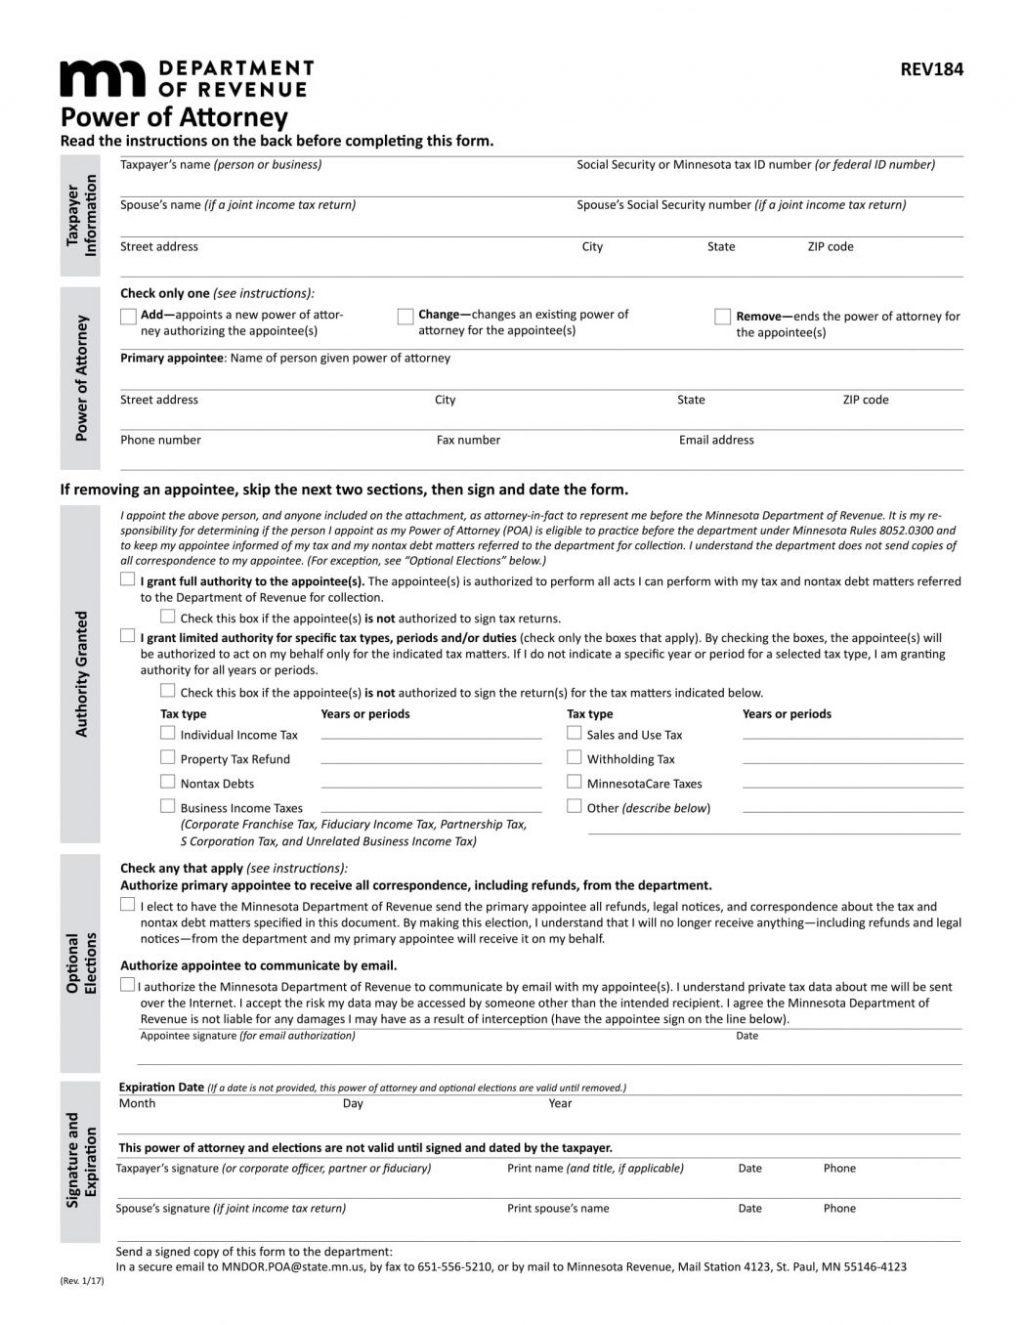 1040ez Wisconsin State Tax Form